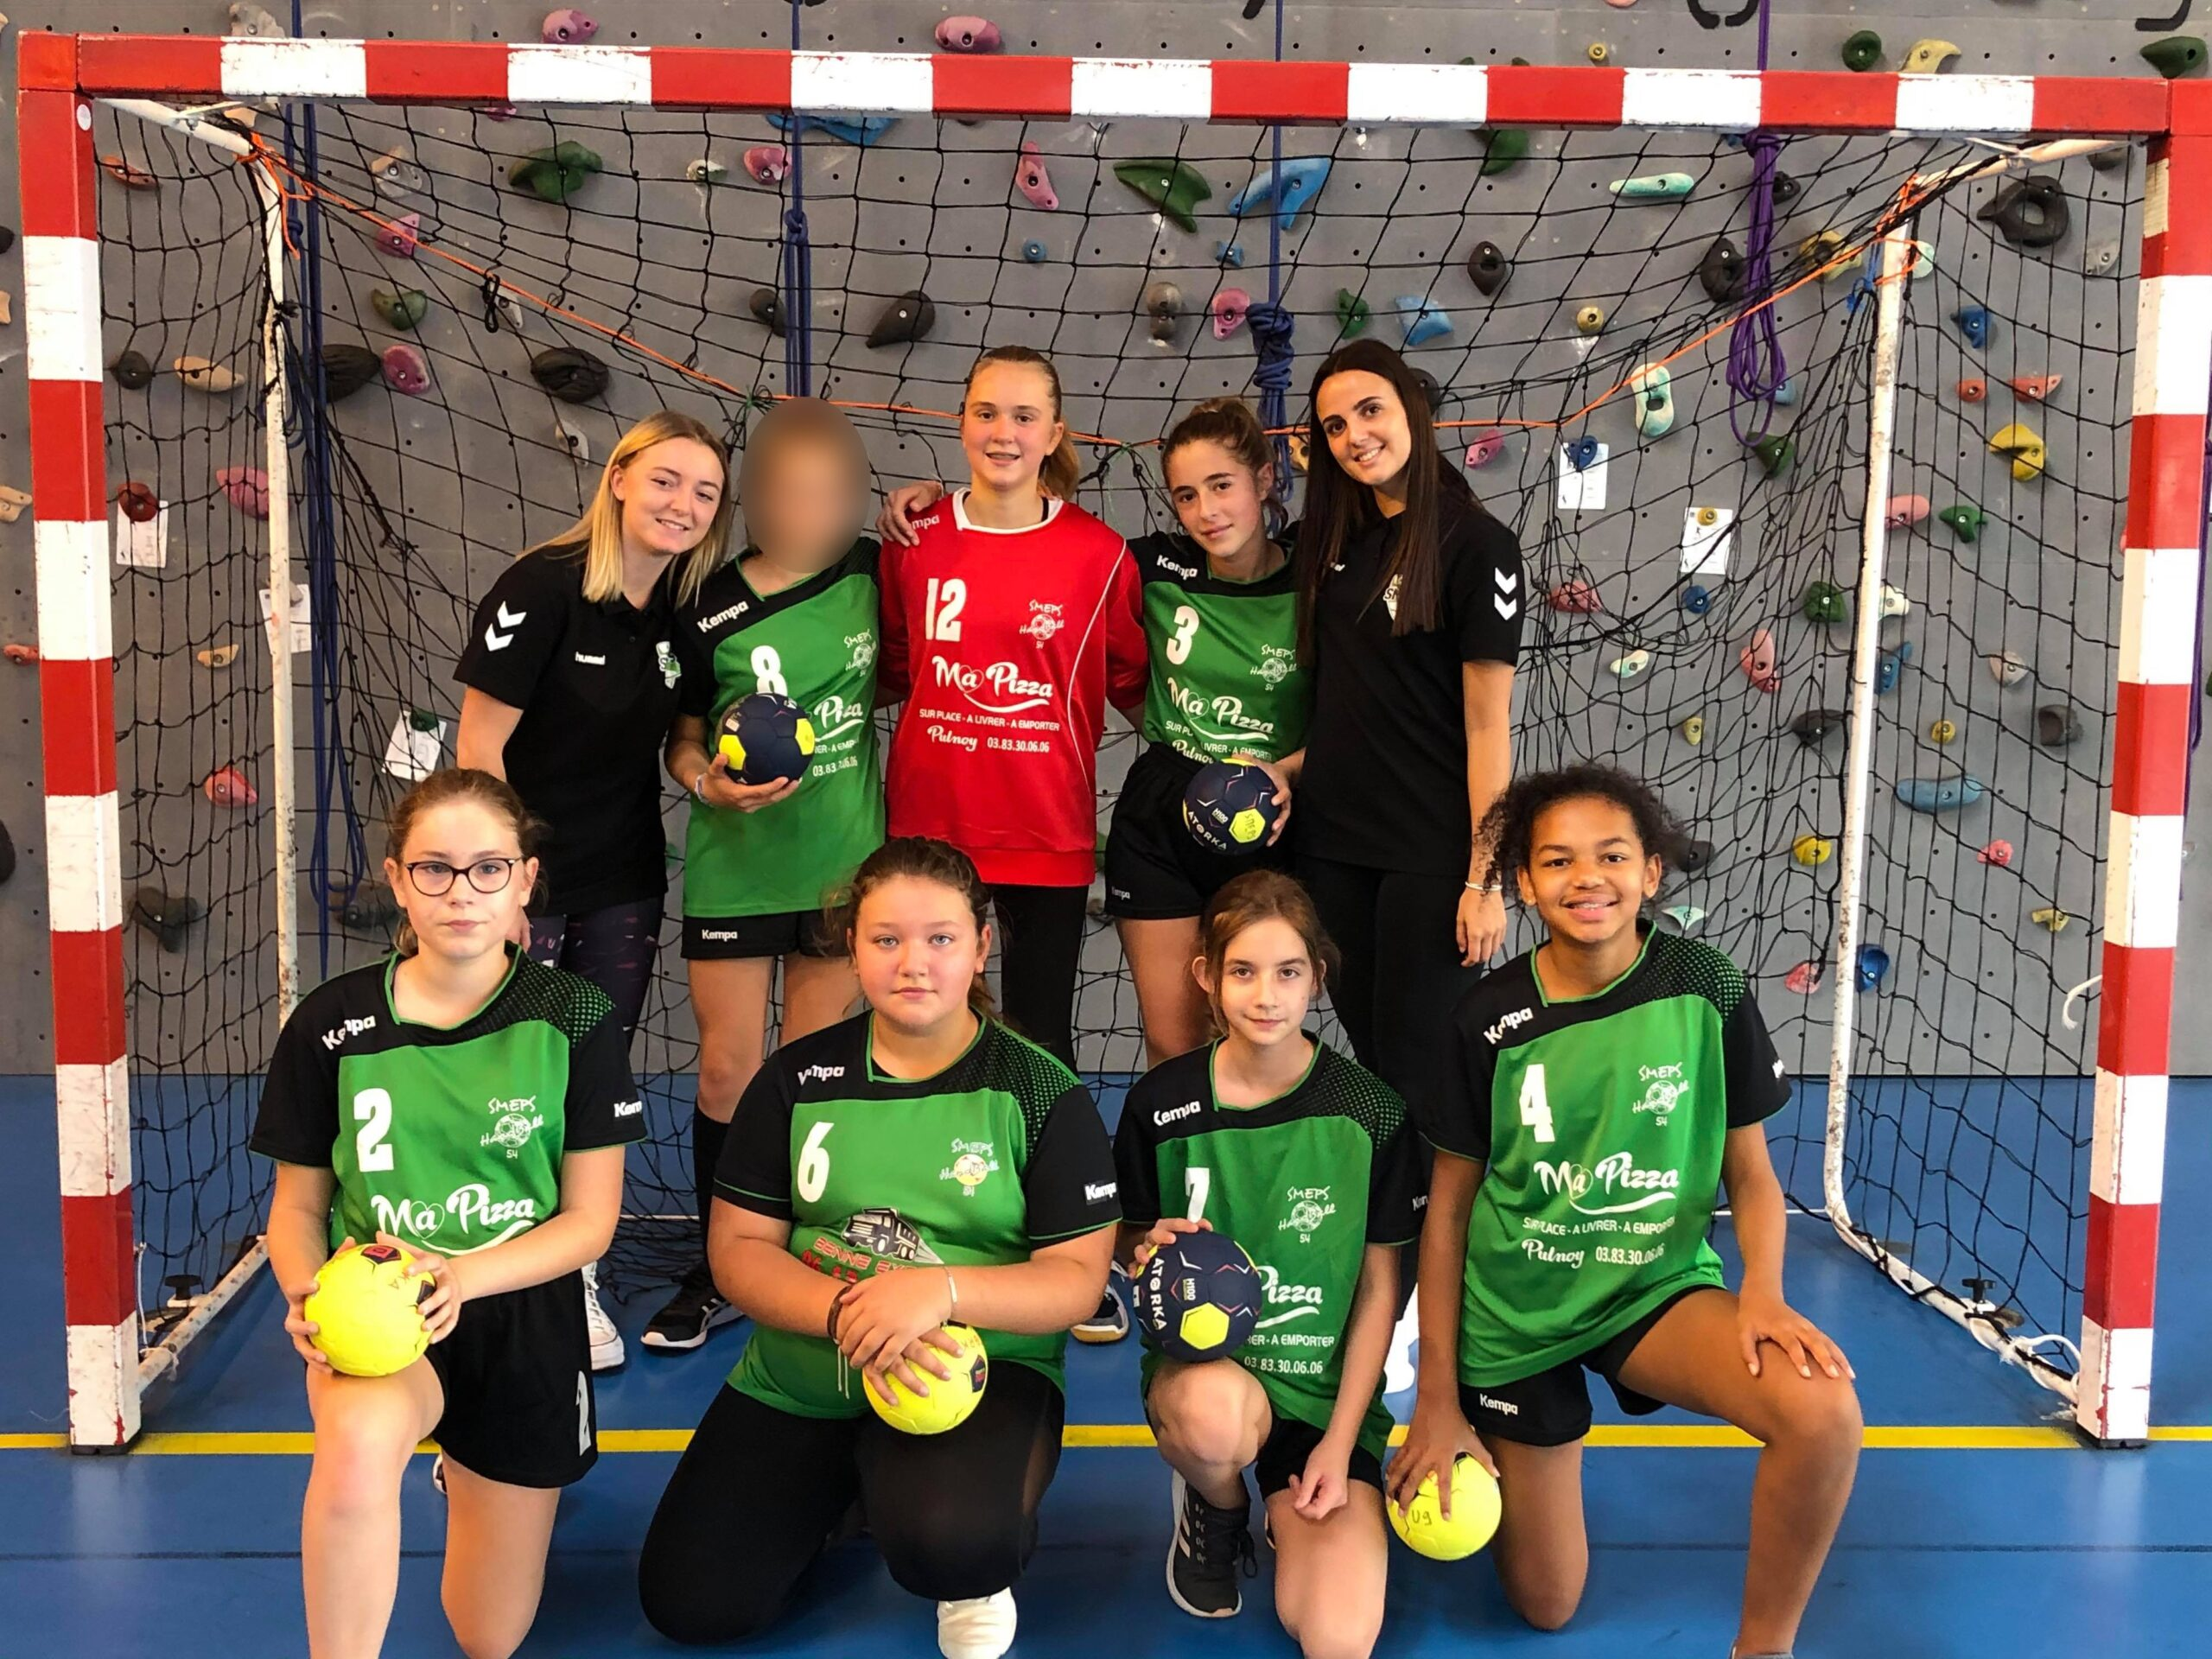 Championnat interdépartemental des - 15 filles du SMEPS Handball